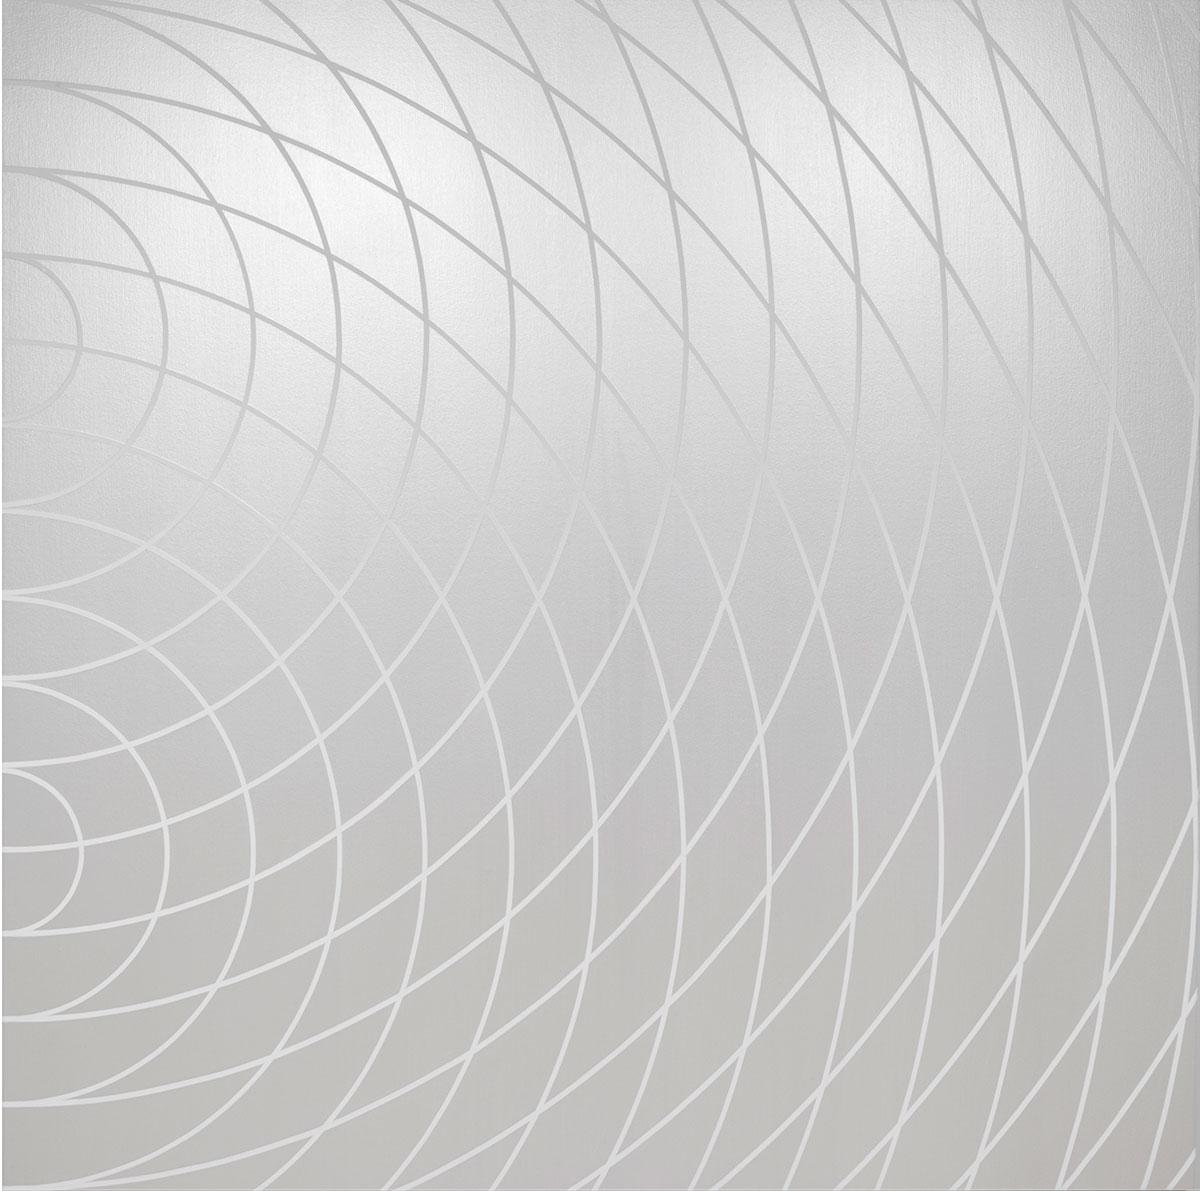 Double-Slit Interference – Steven Salzman